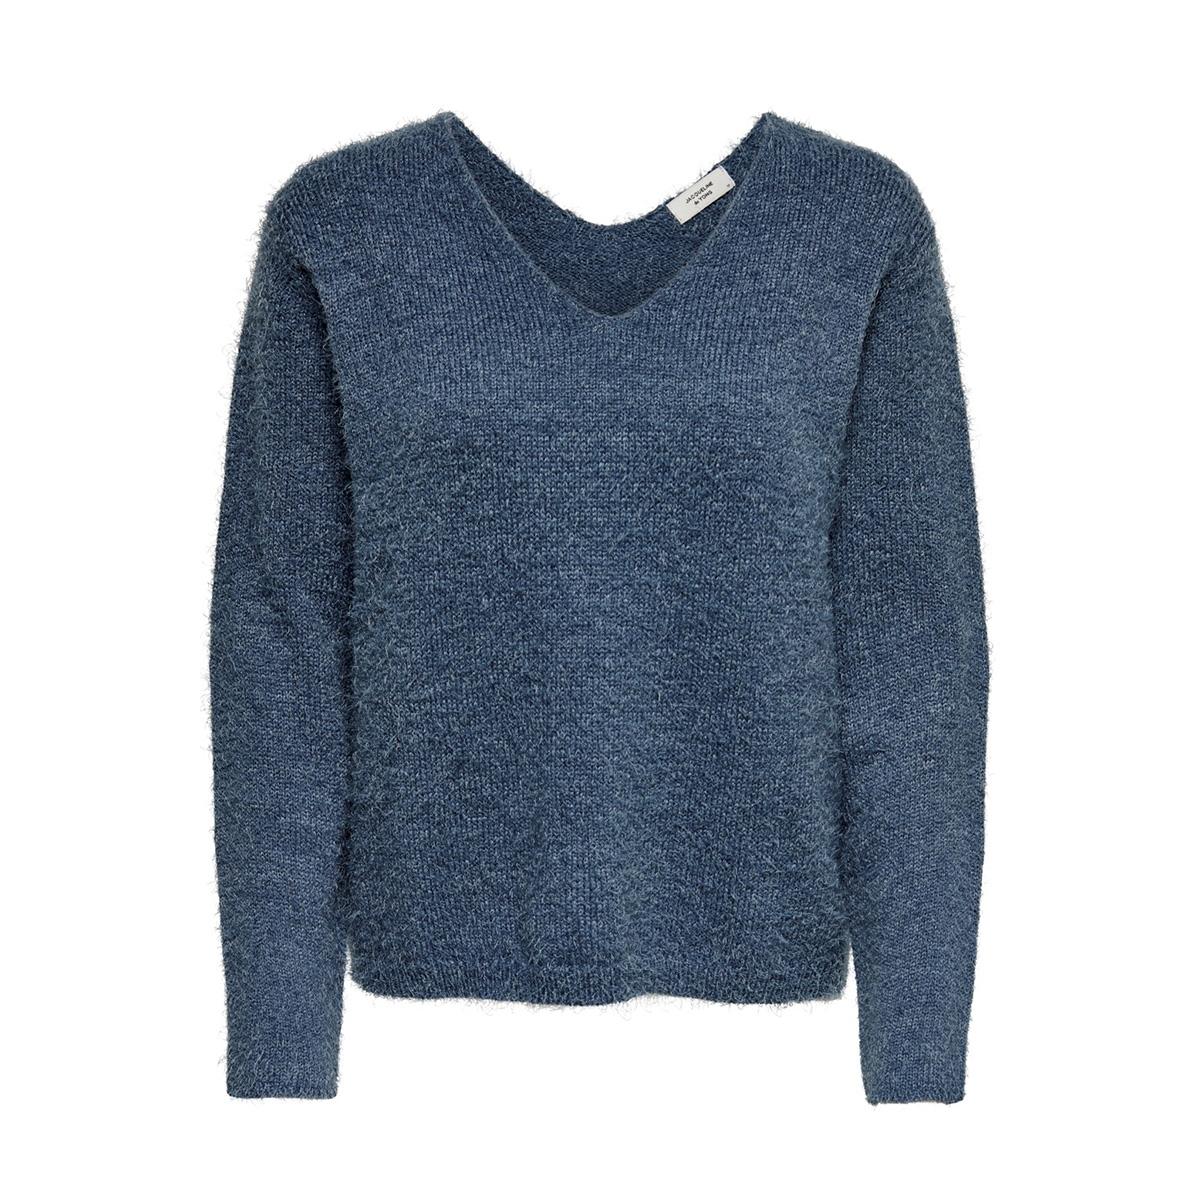 jdycheer l/s v-neck pullover knt 15190300 jacqueline de yong trui bering sea